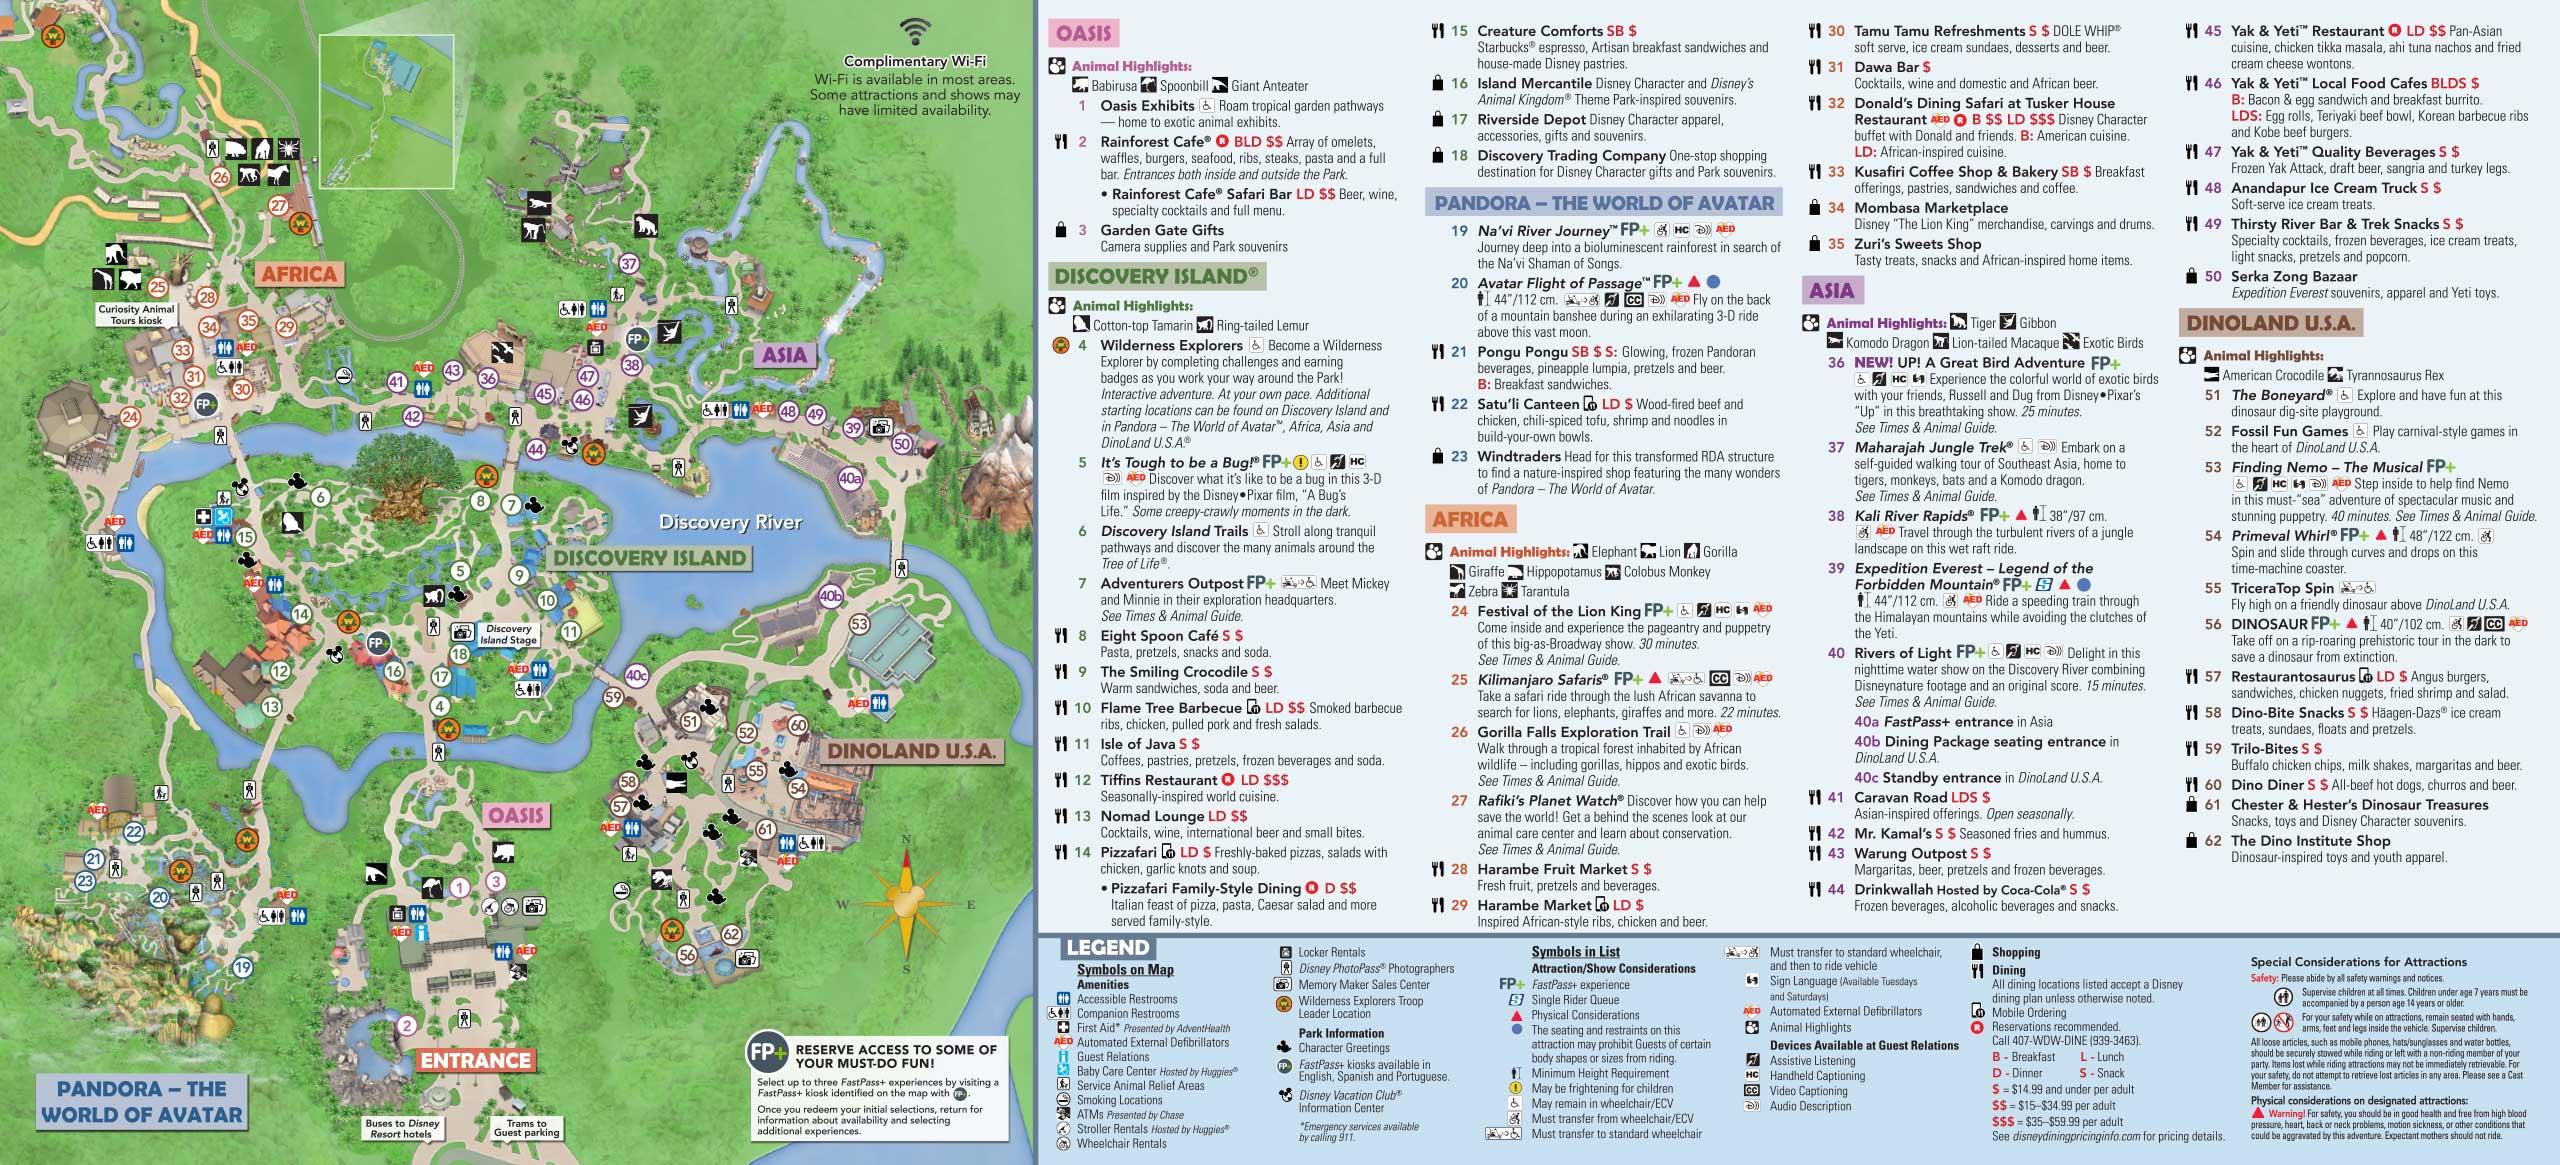 January 2019 Walt Disney World Park Maps - Photo 4 of 14